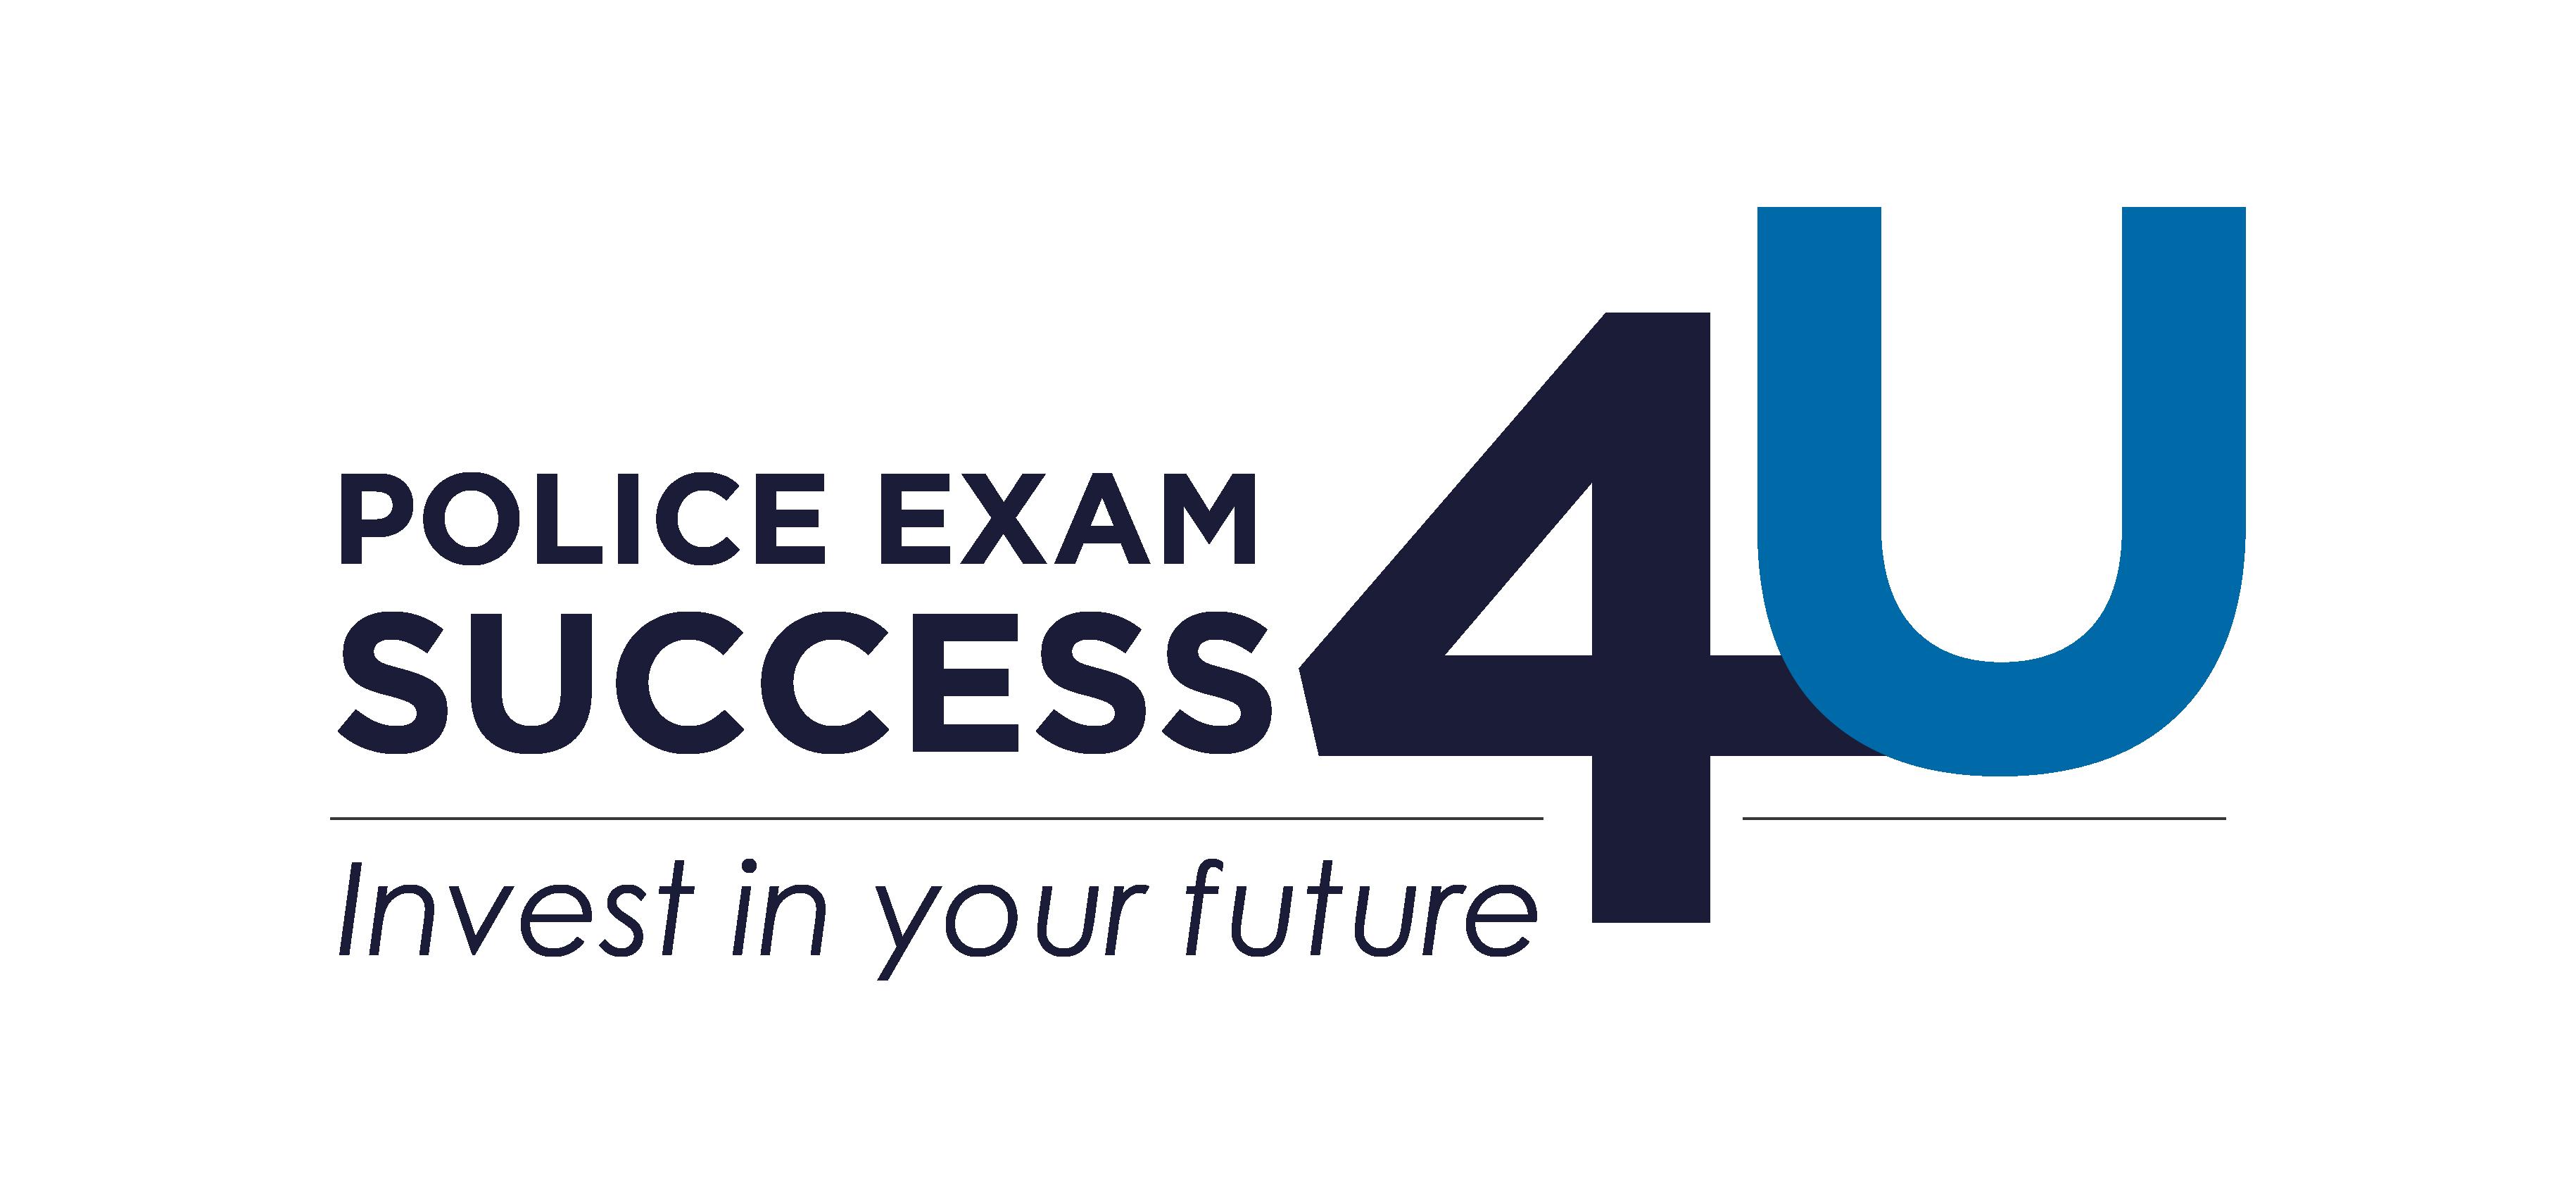 Police Exam Success 4U